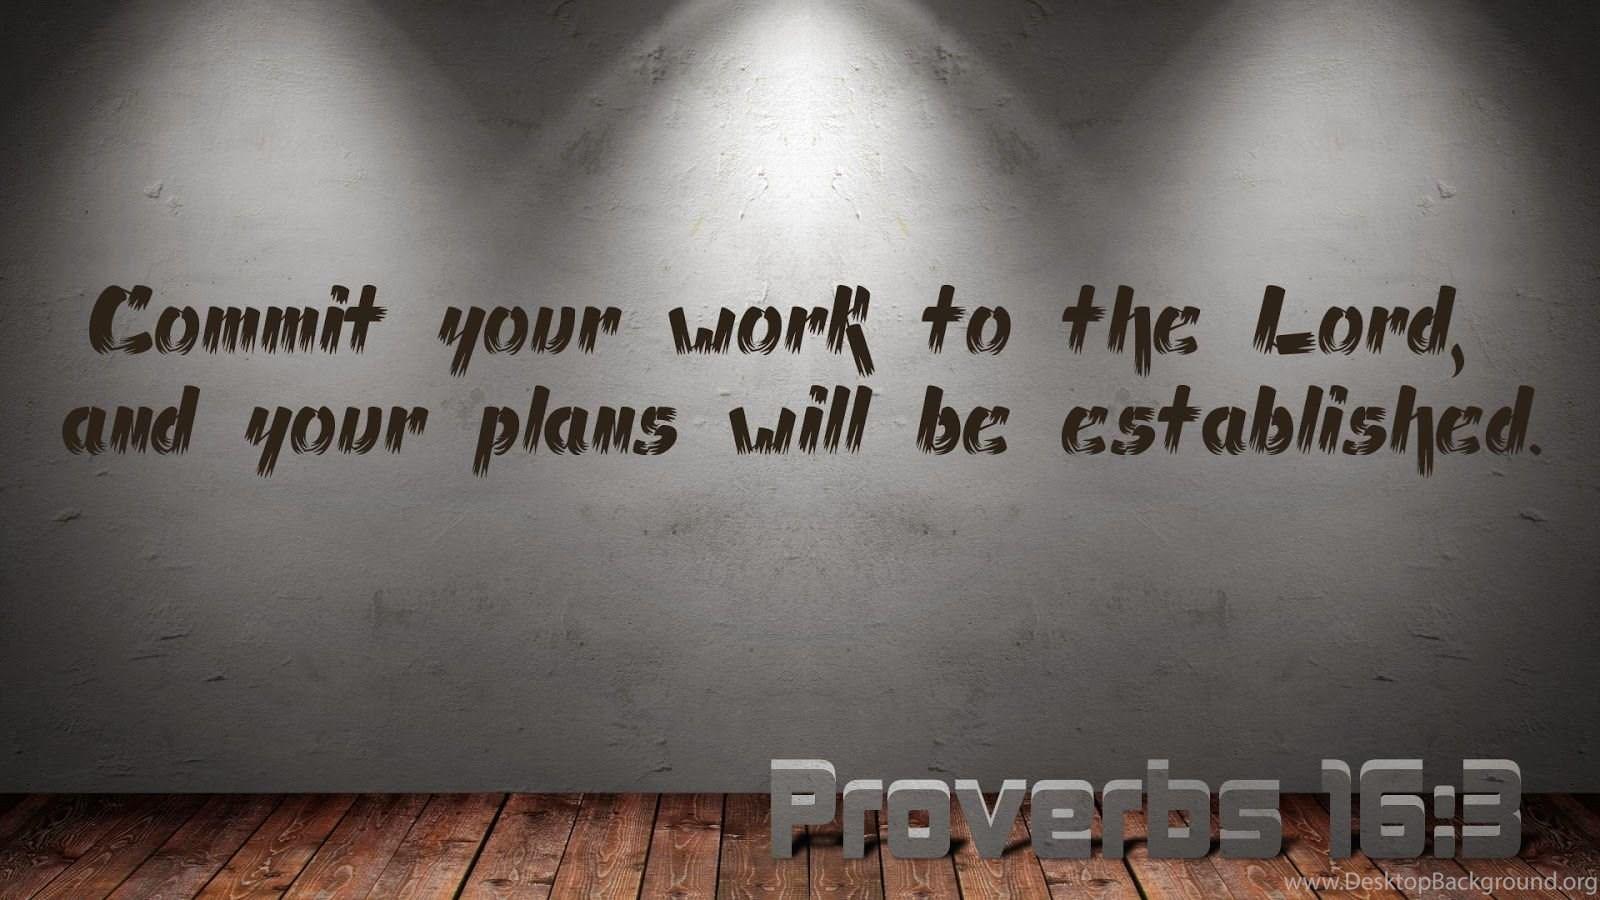 Scripture Wallpaper Proverbs 16 3 Bible Verse Wallpapers Desktop Background